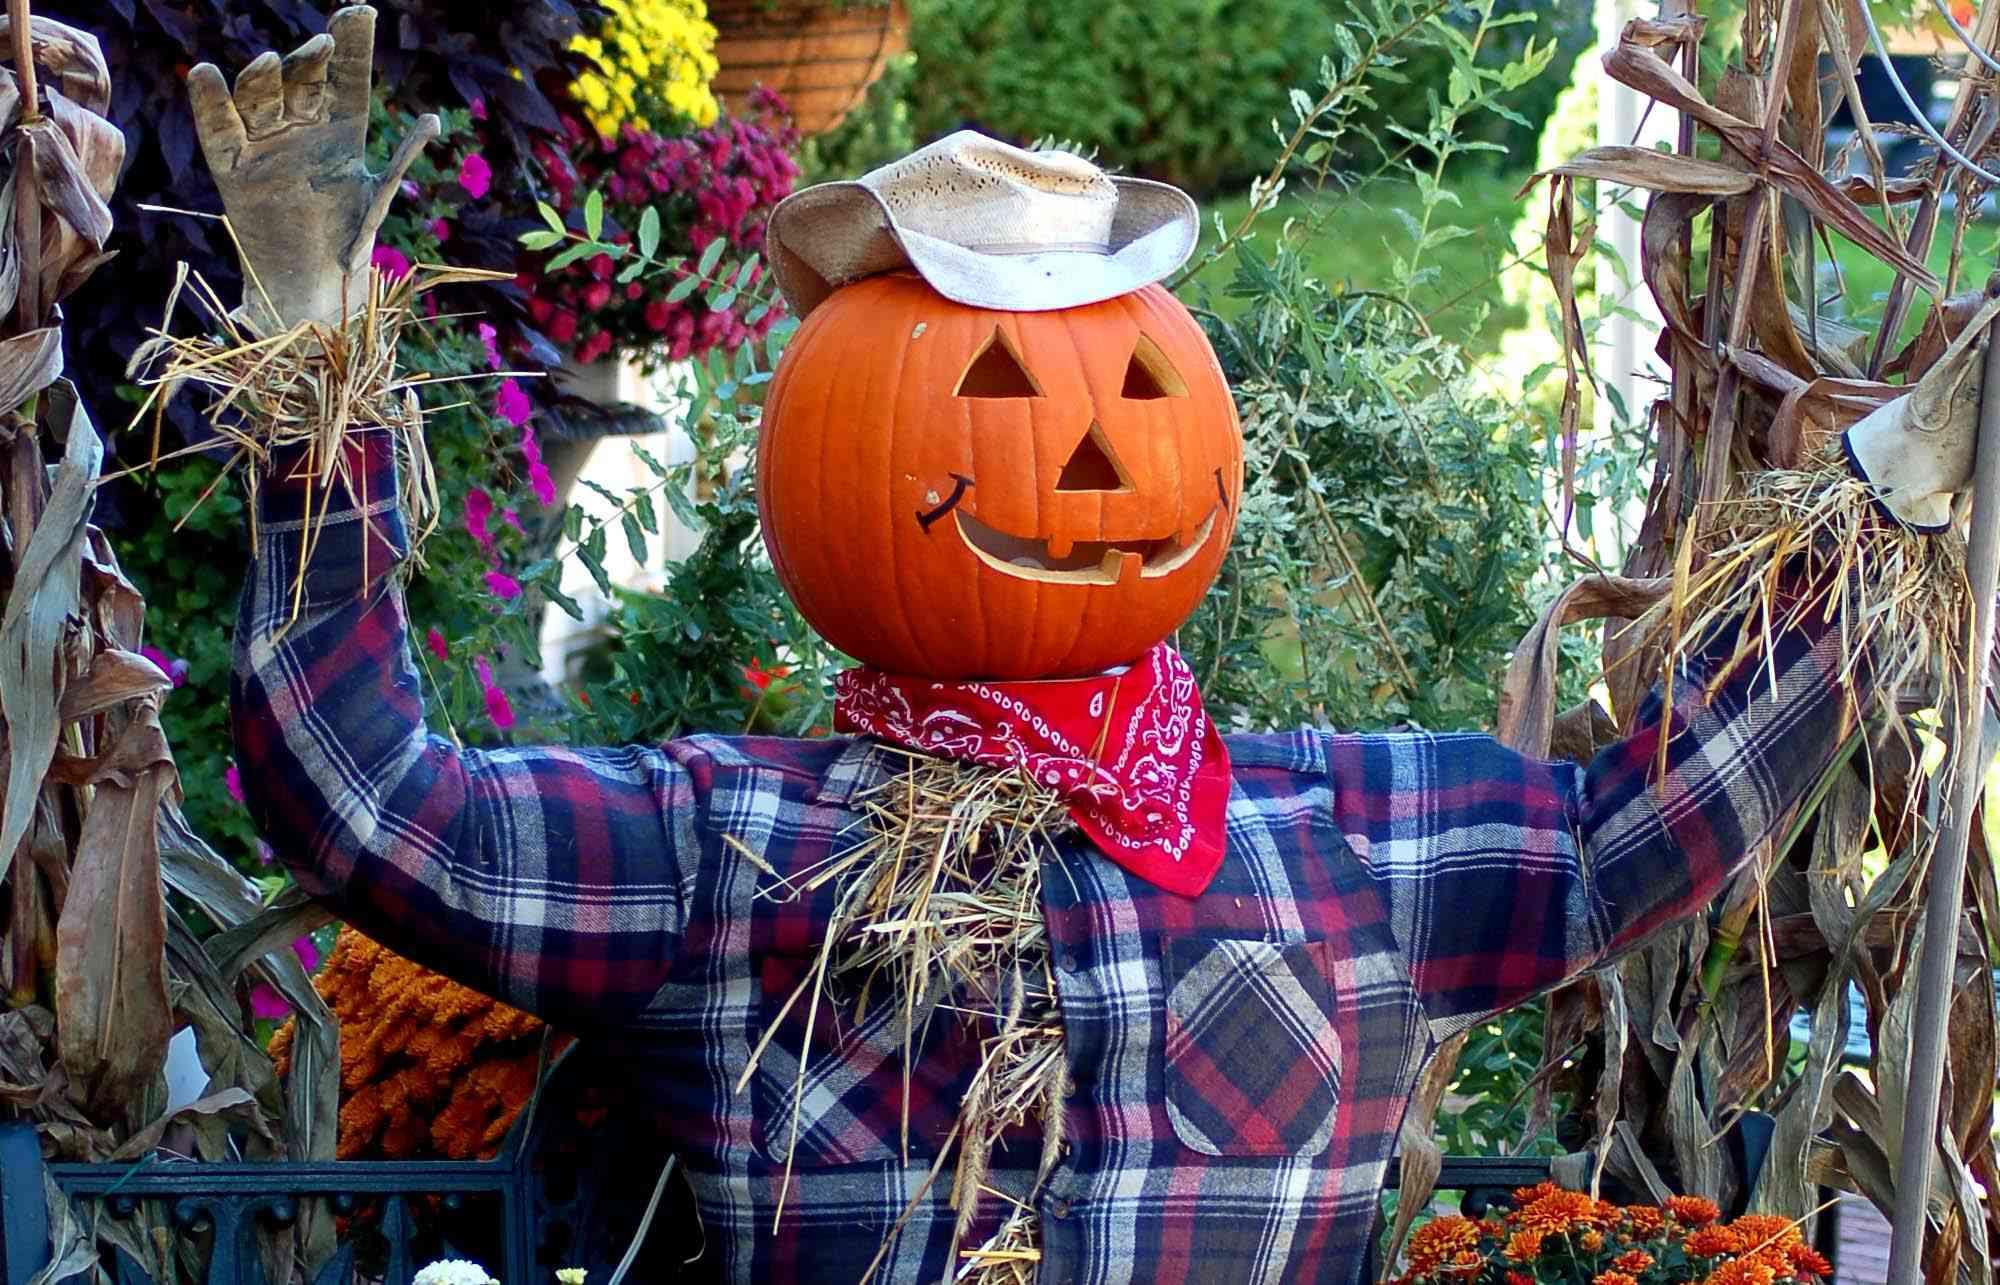 Scarecrow with a jack-o'-lantern head